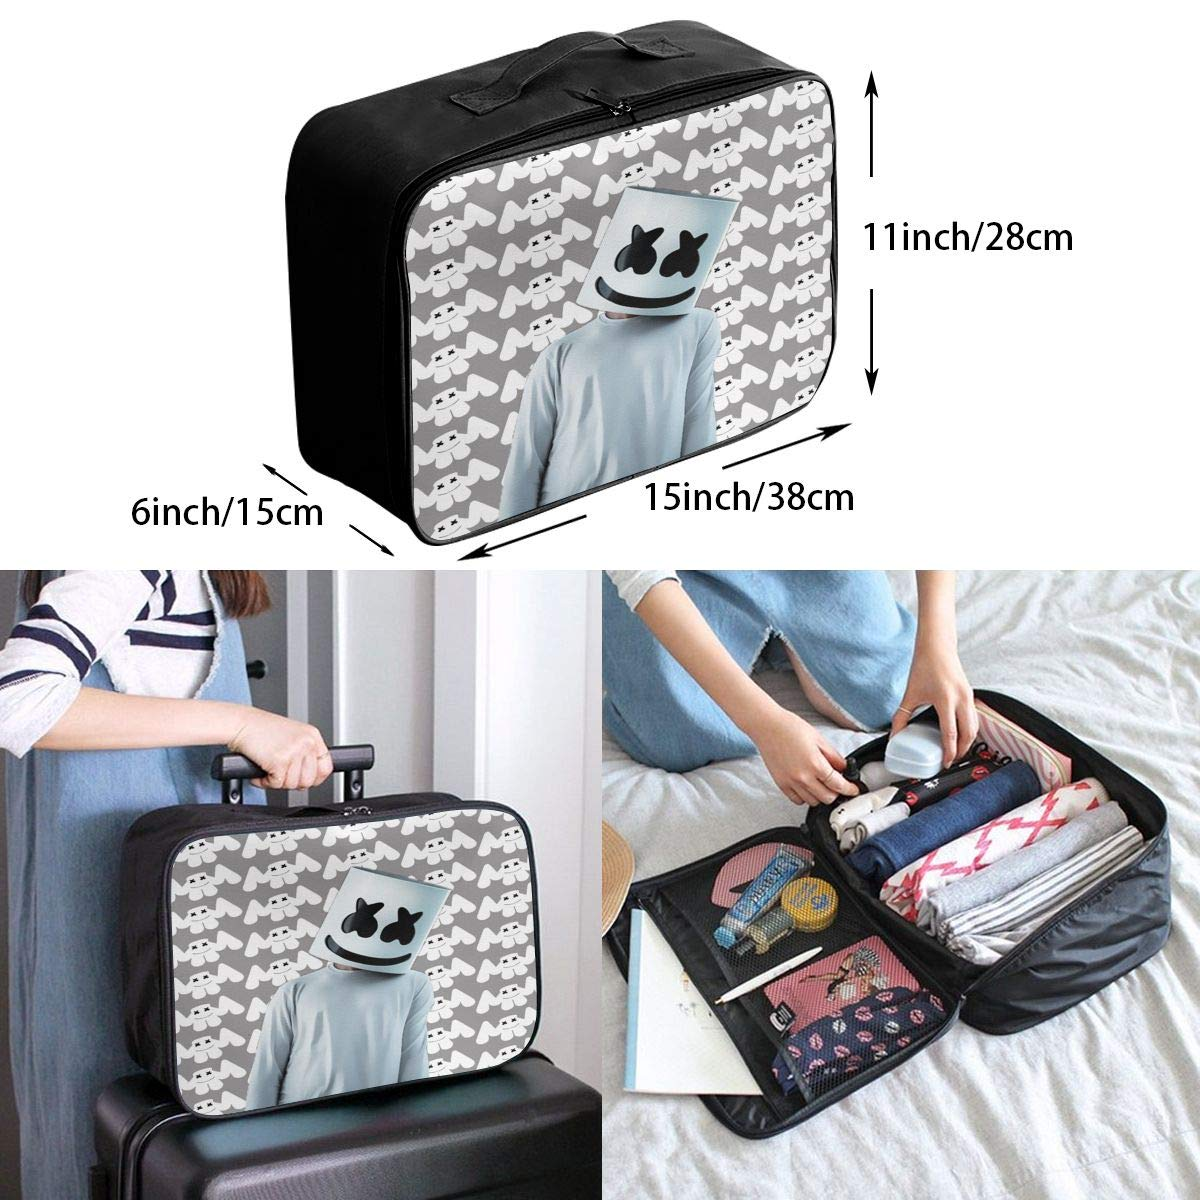 Ma/_rshm/_ello Large Capacity Portable Luggage Bag Travel Lightweight Waterproof Storage Carry Luggage Duffel Tote Bag